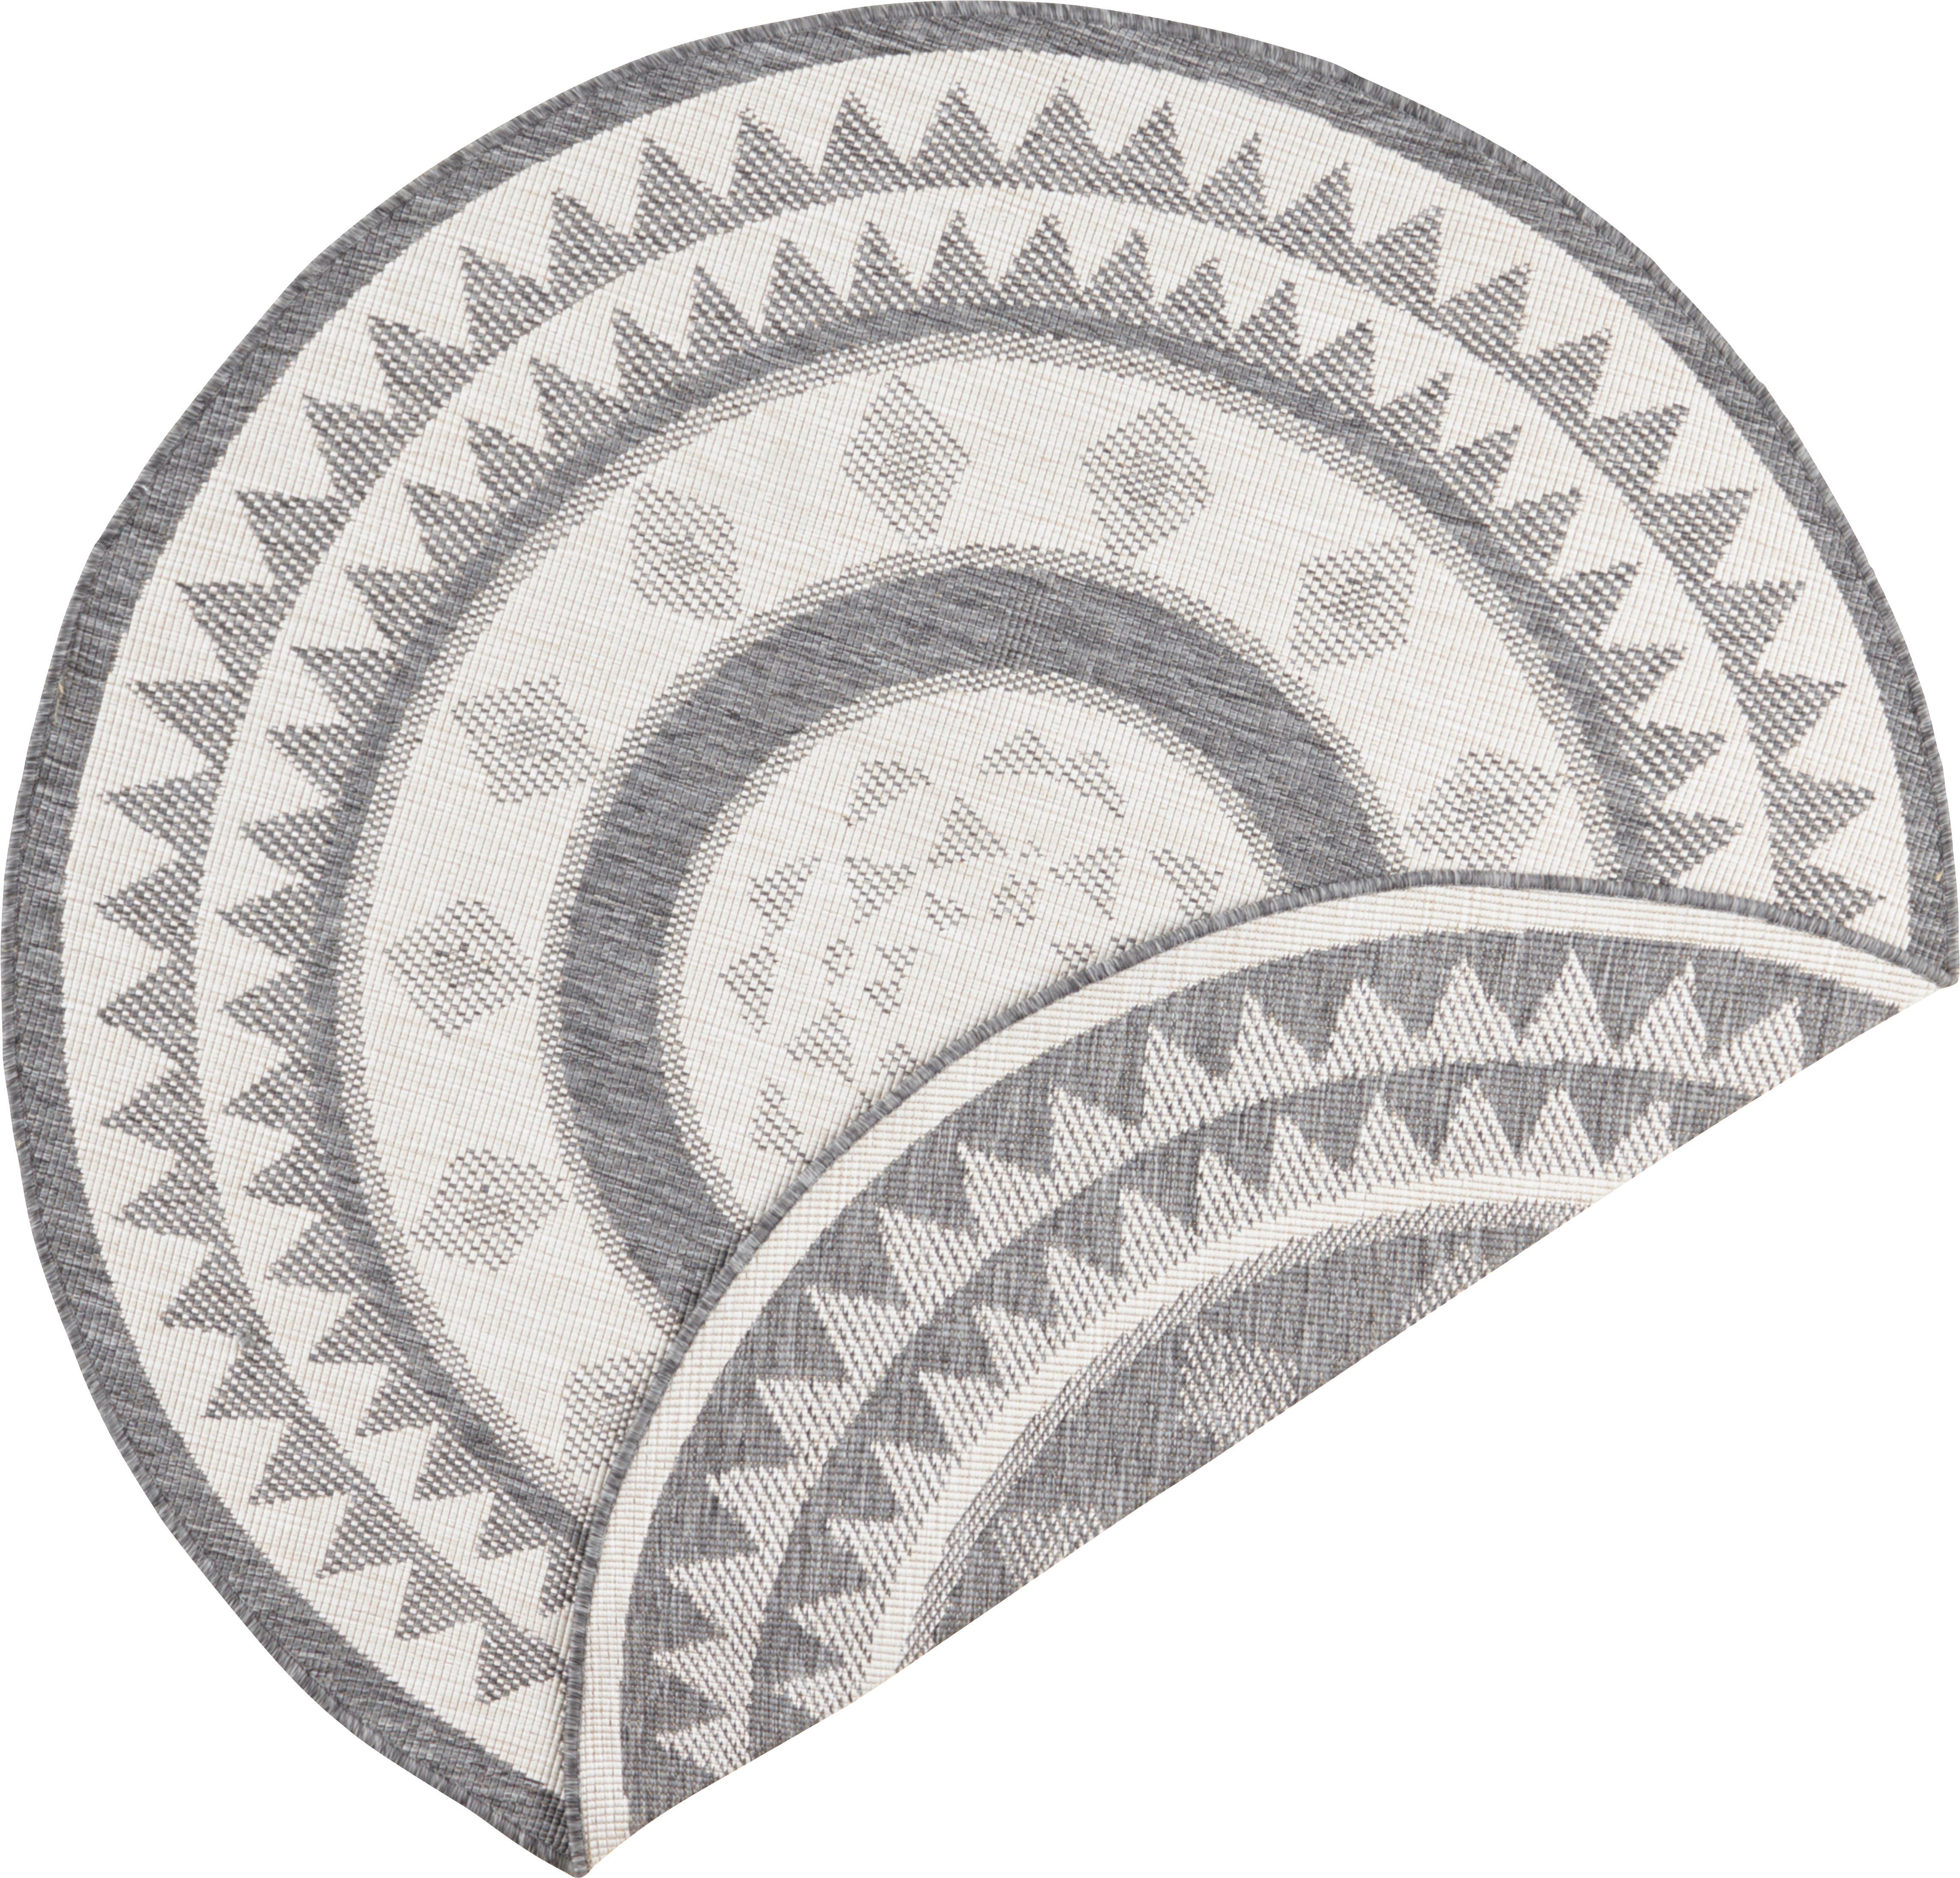 Alfombra redonda reversible de interior/exterior Jamaica, Gris, crema, Ø 140 cm (Tamaño M)